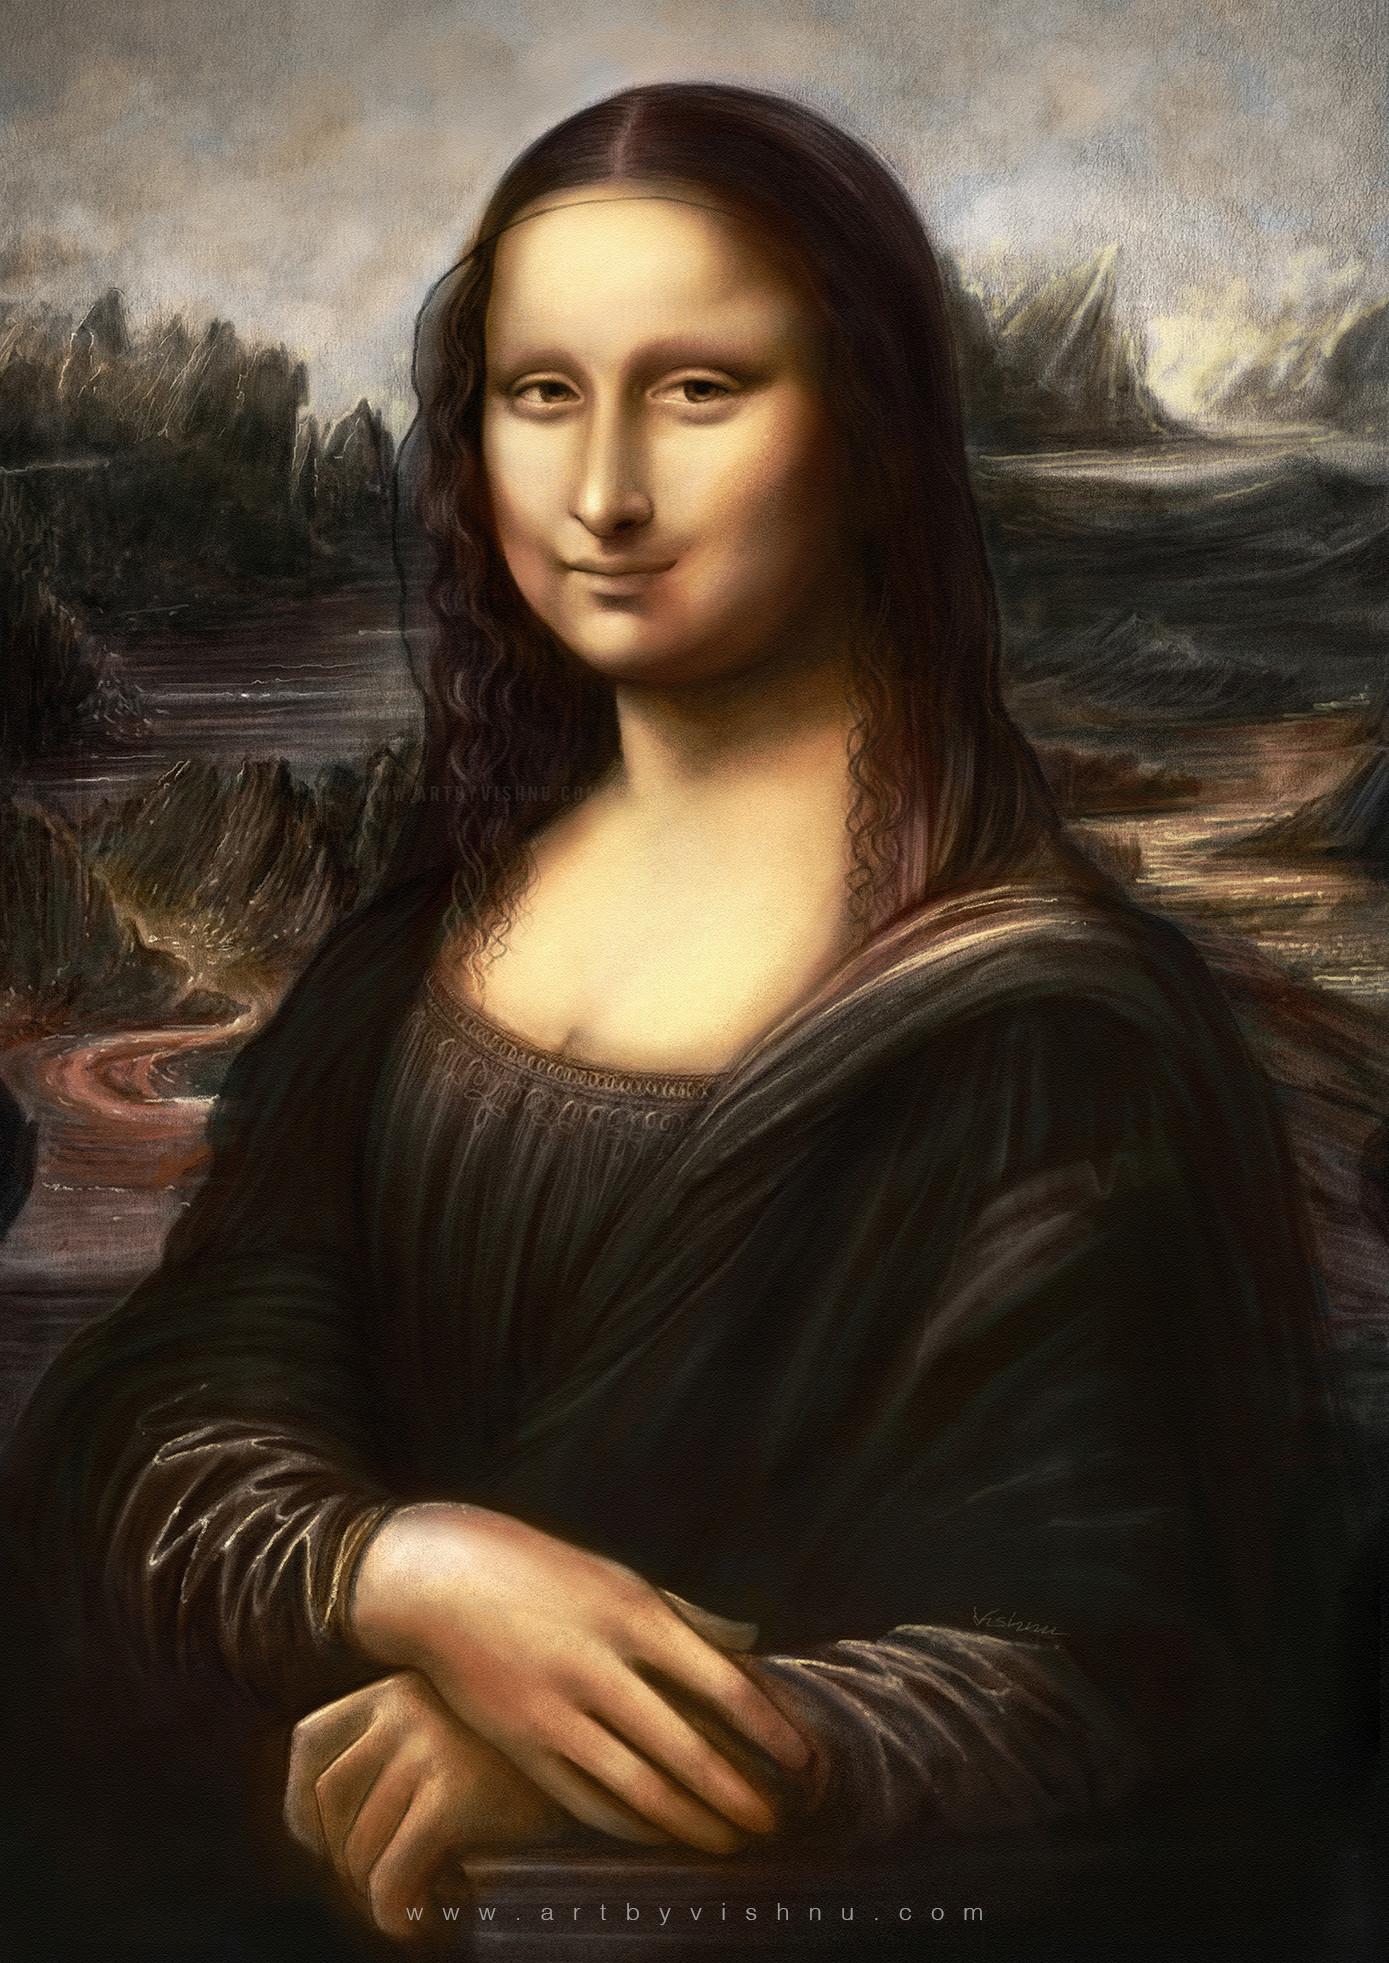 картинка монолиза кто нарисовал подборке много